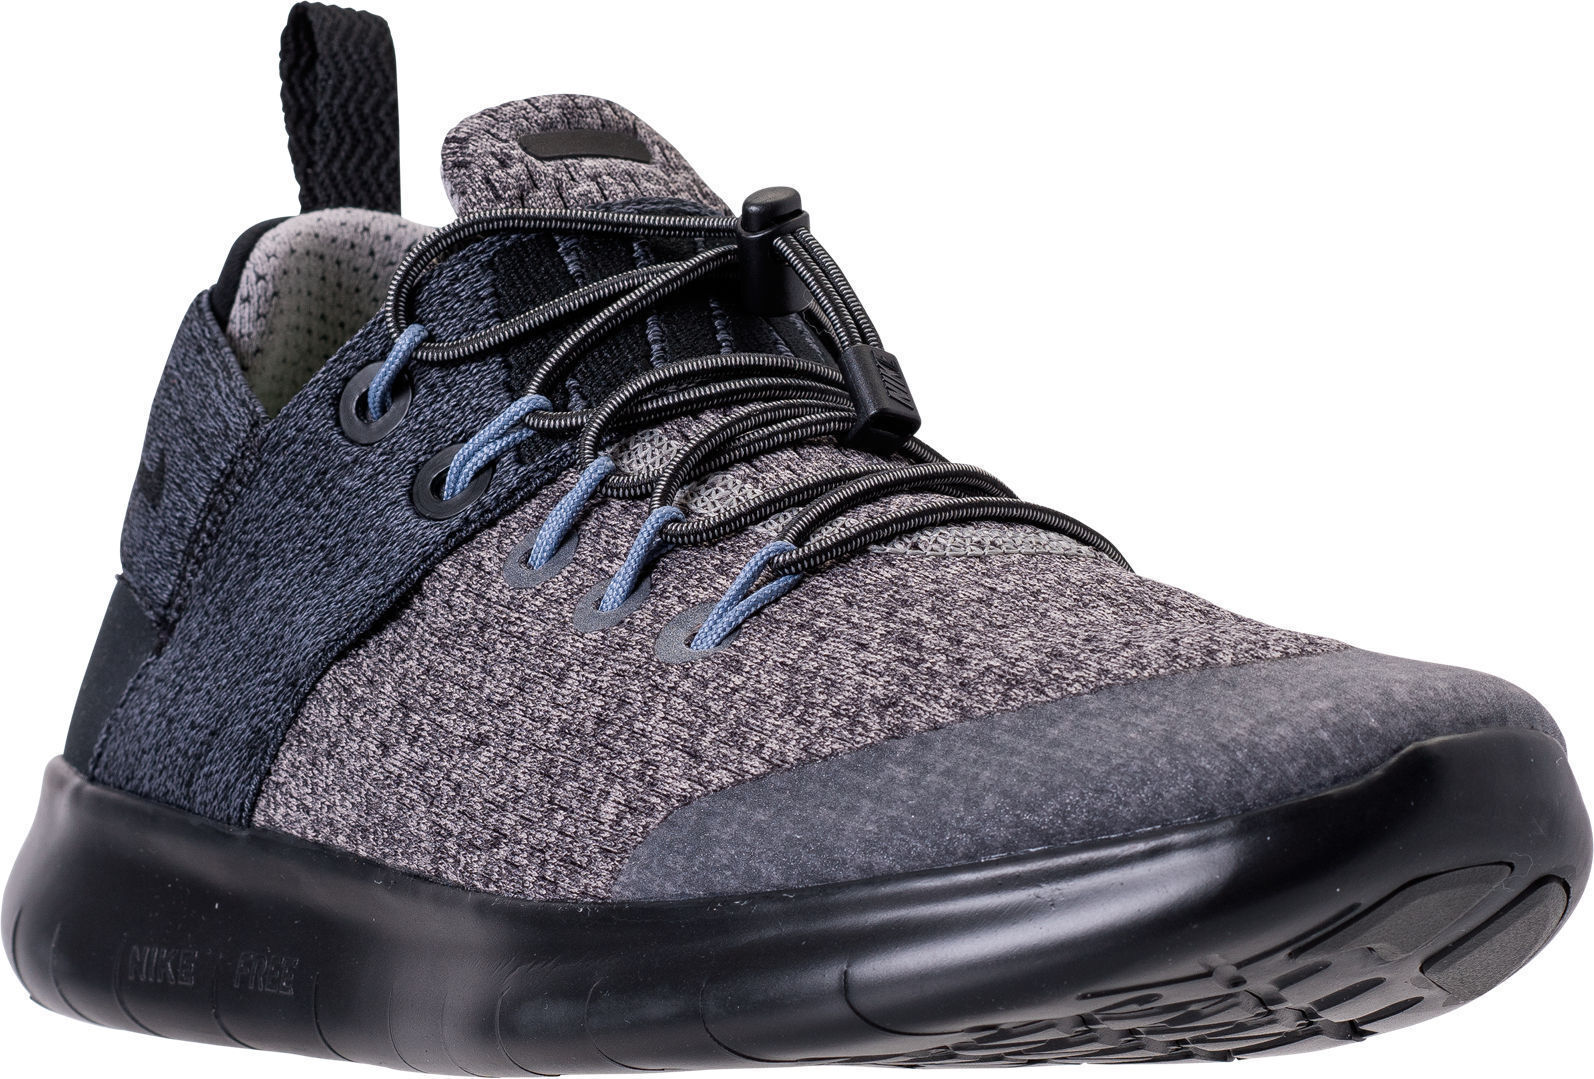 Women's Nike Free RN Commuter 2017 Premium Running Shoe Sz 6.5 (AA1622 001)